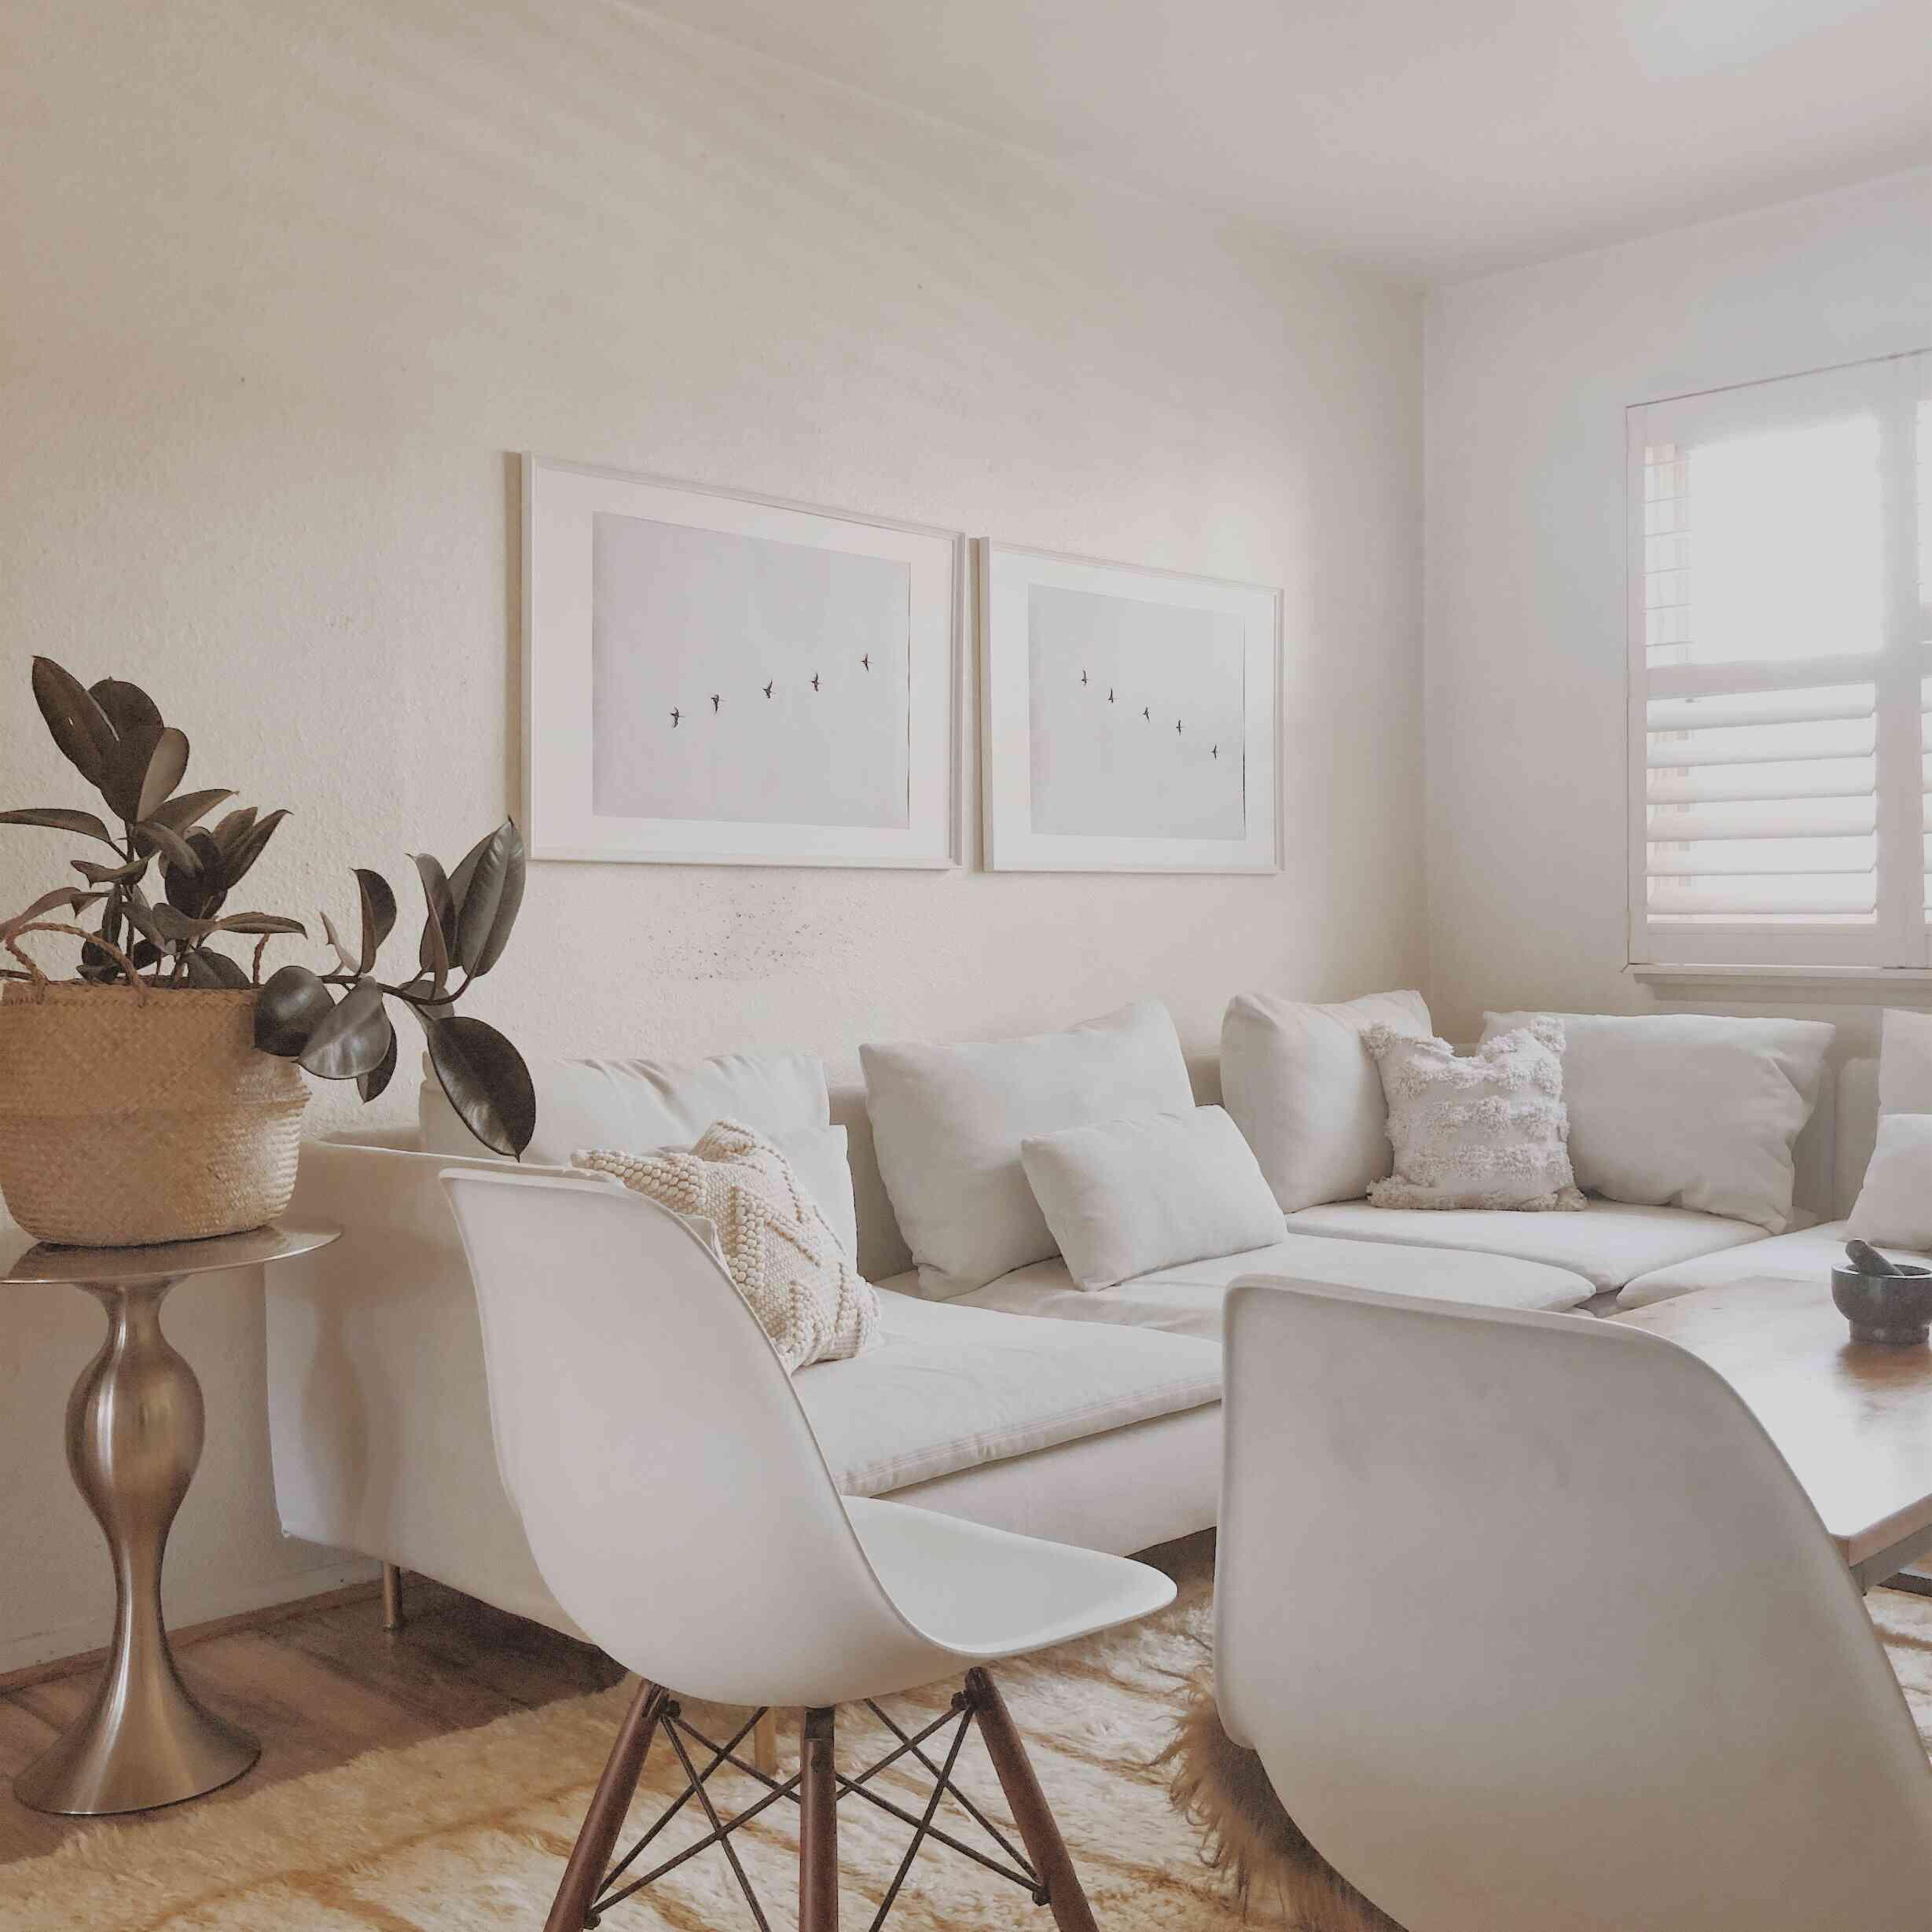 Living room in neutral color palette